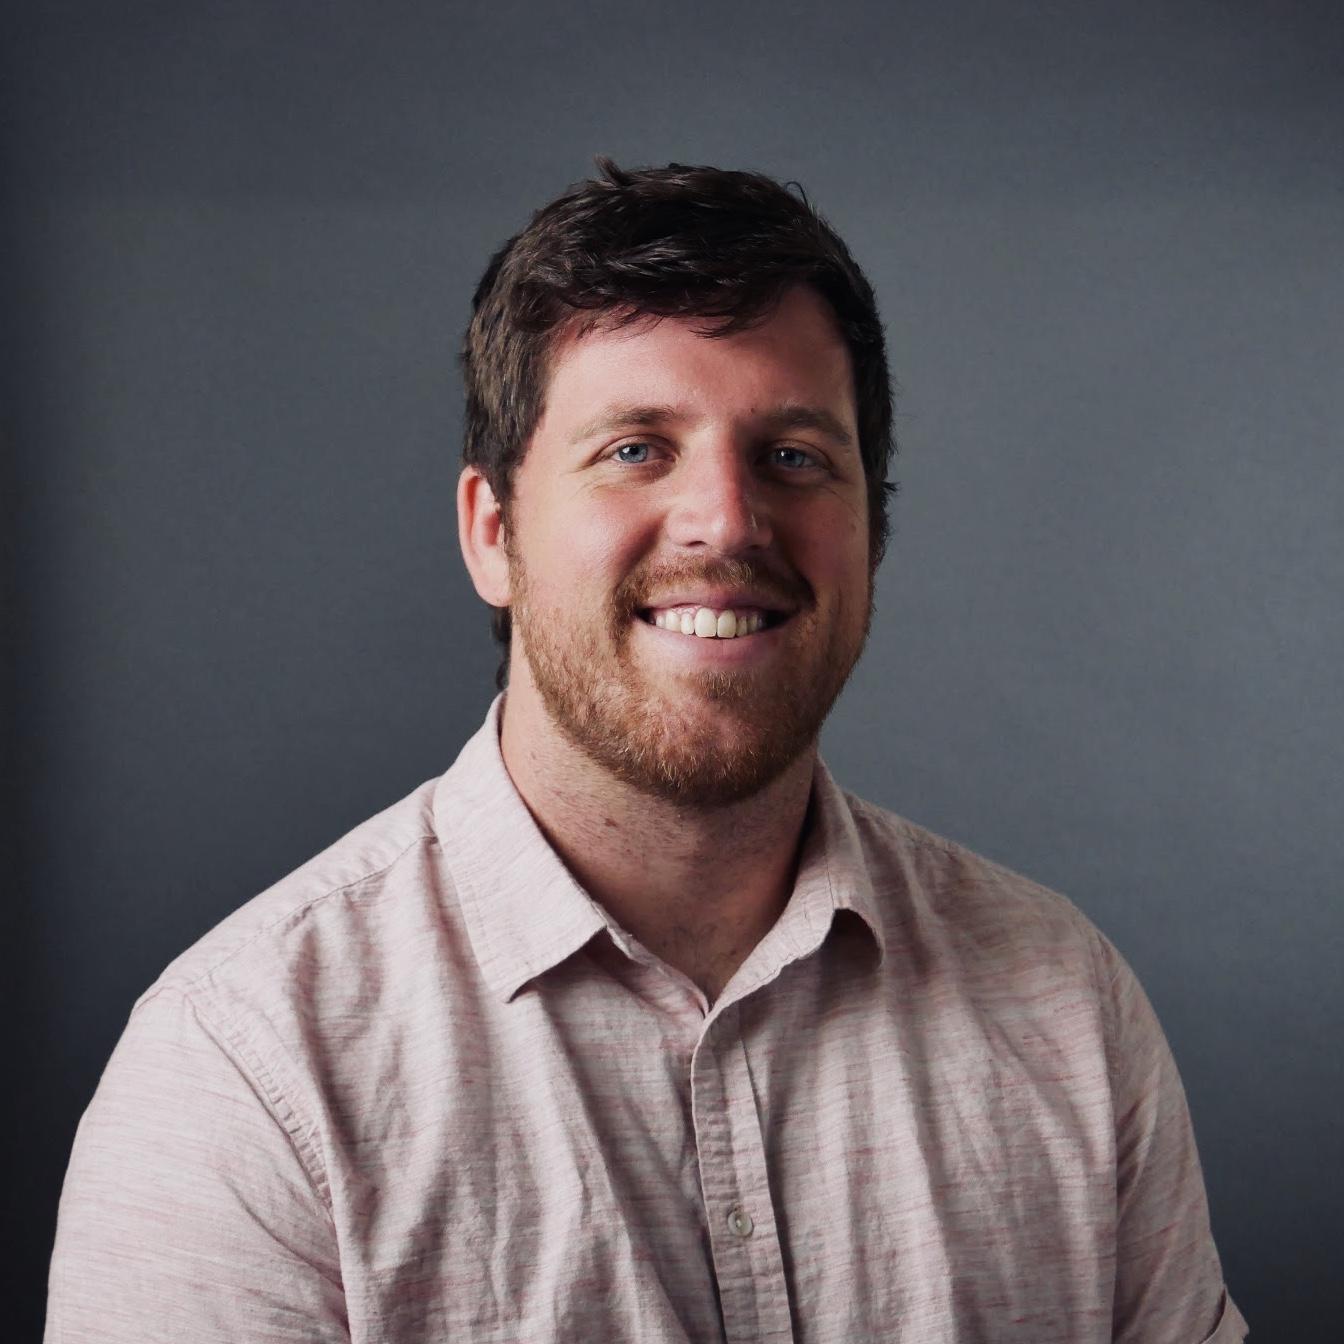 Christian Hogan - Cross Cultural Specialist